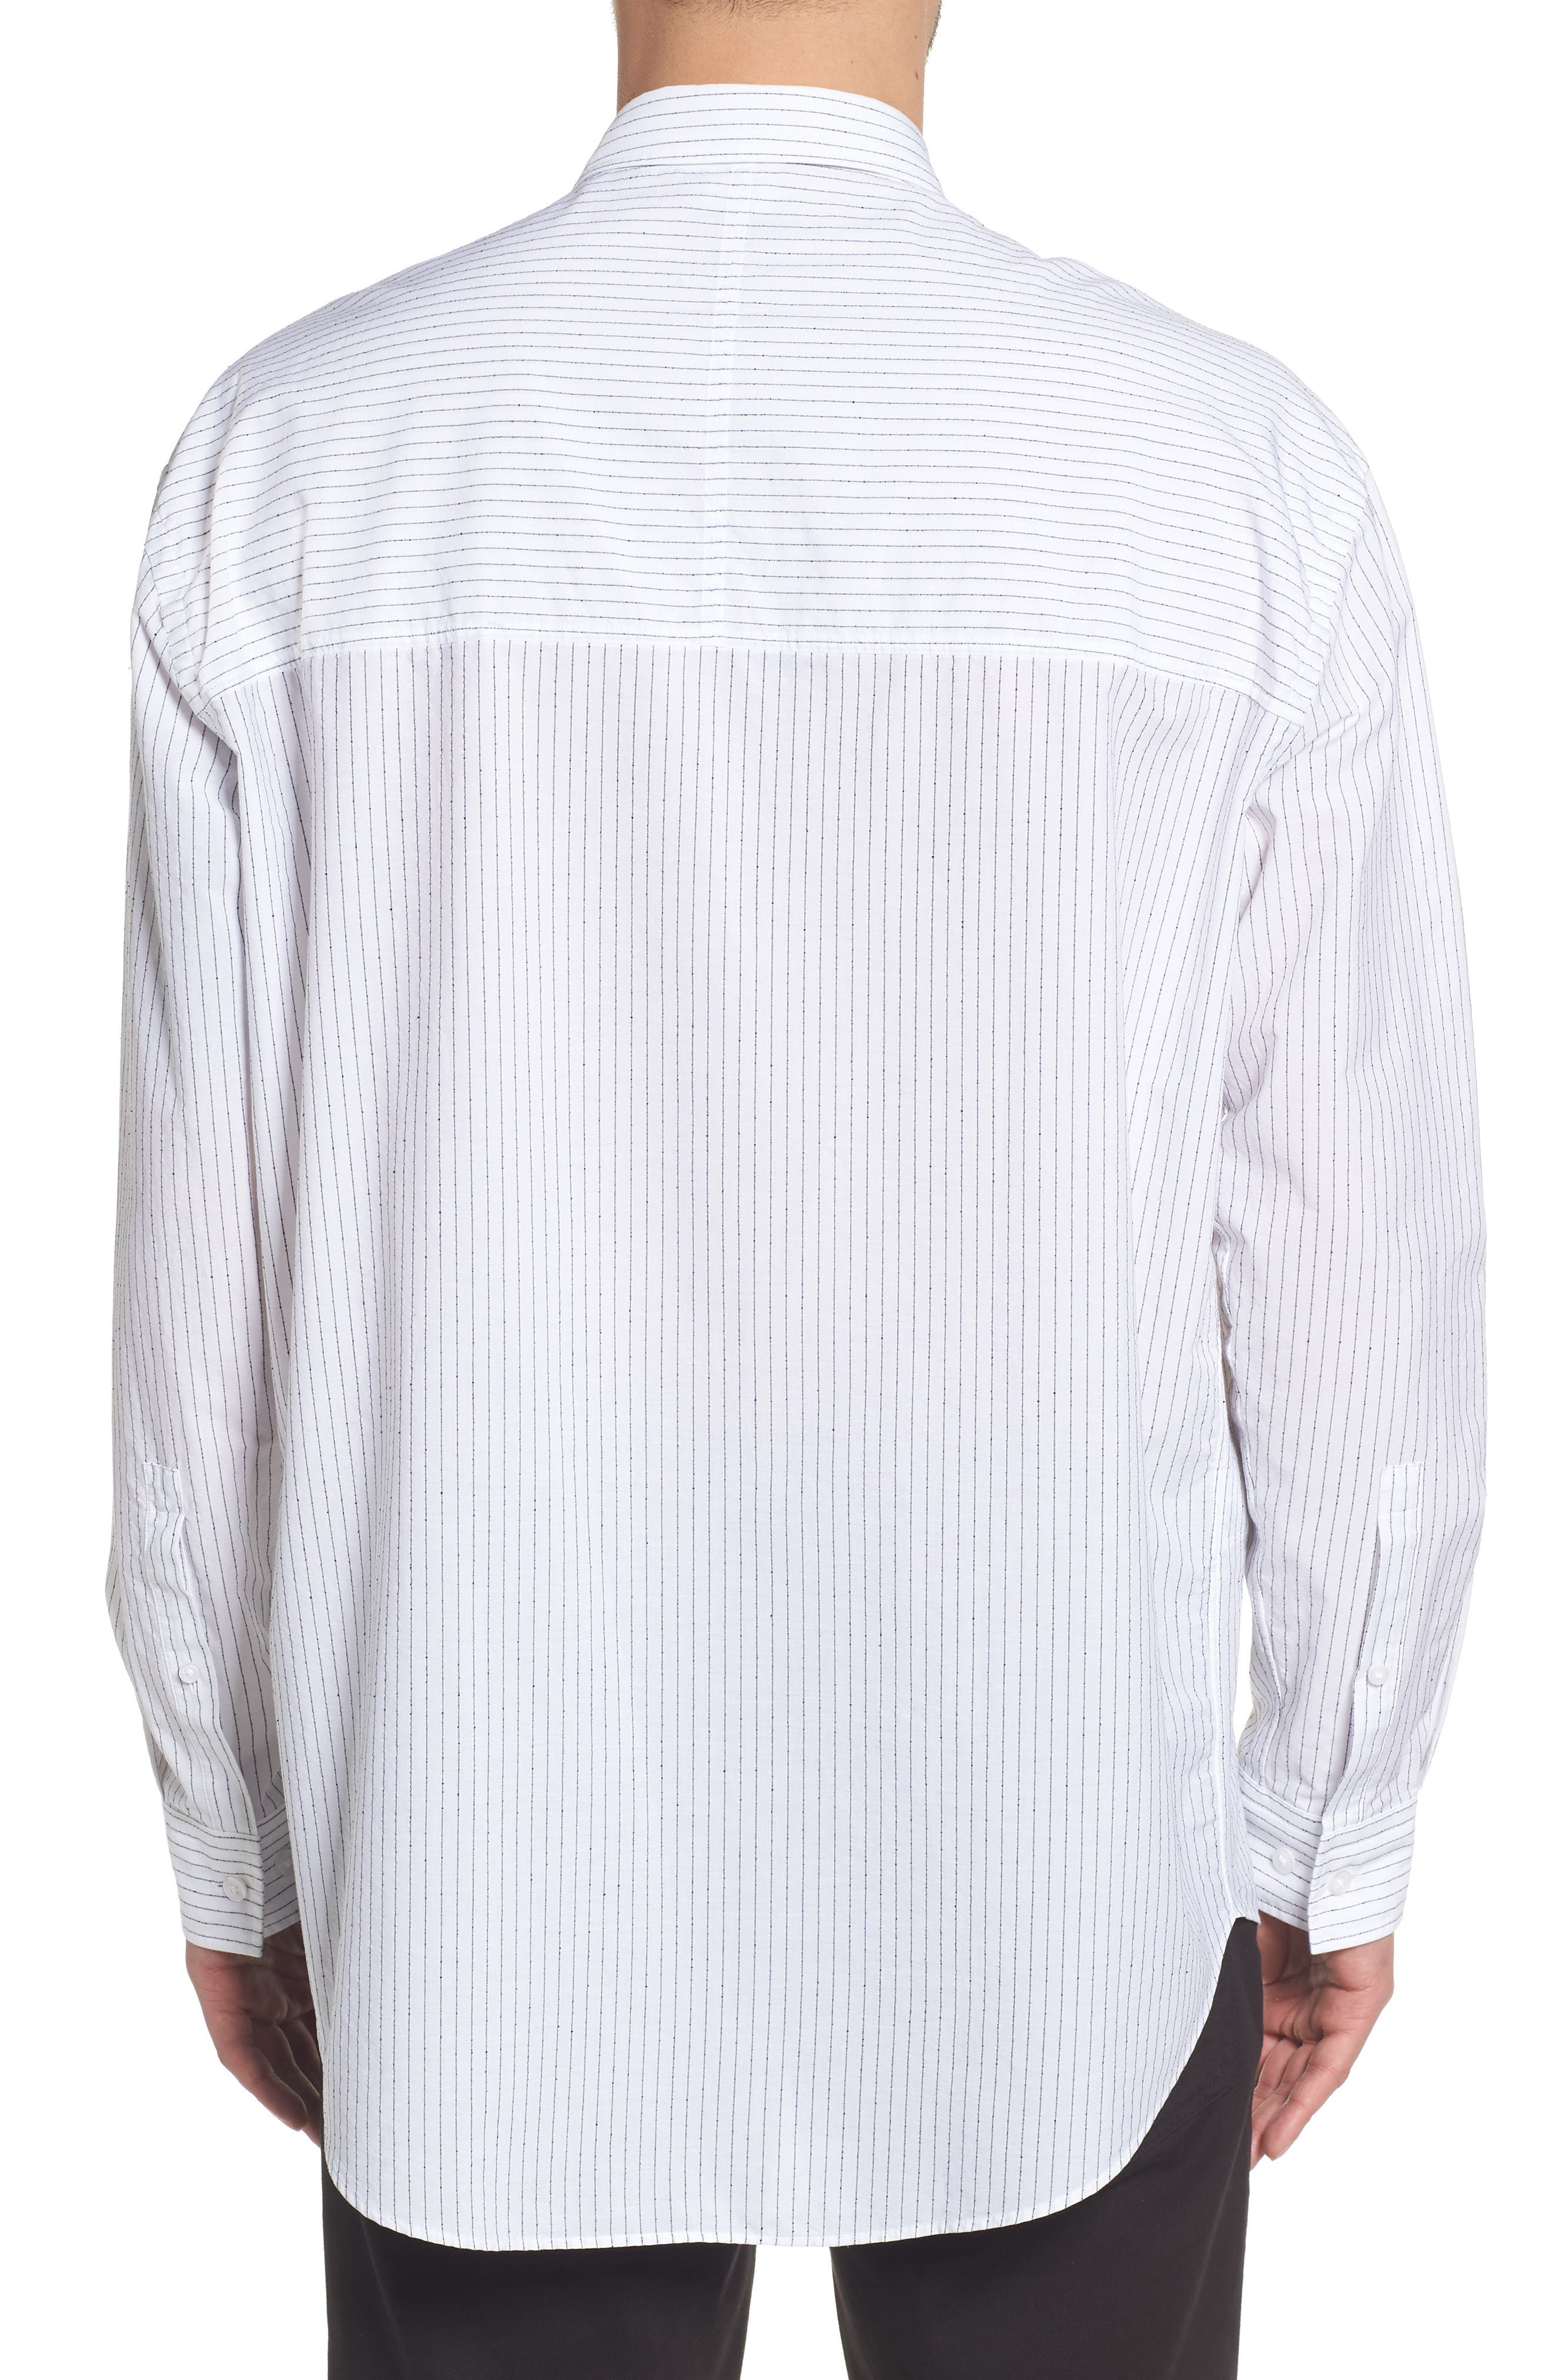 Ery Stripe Classic Fit Sport Shirt,                             Alternate thumbnail 2, color,                             WHITE